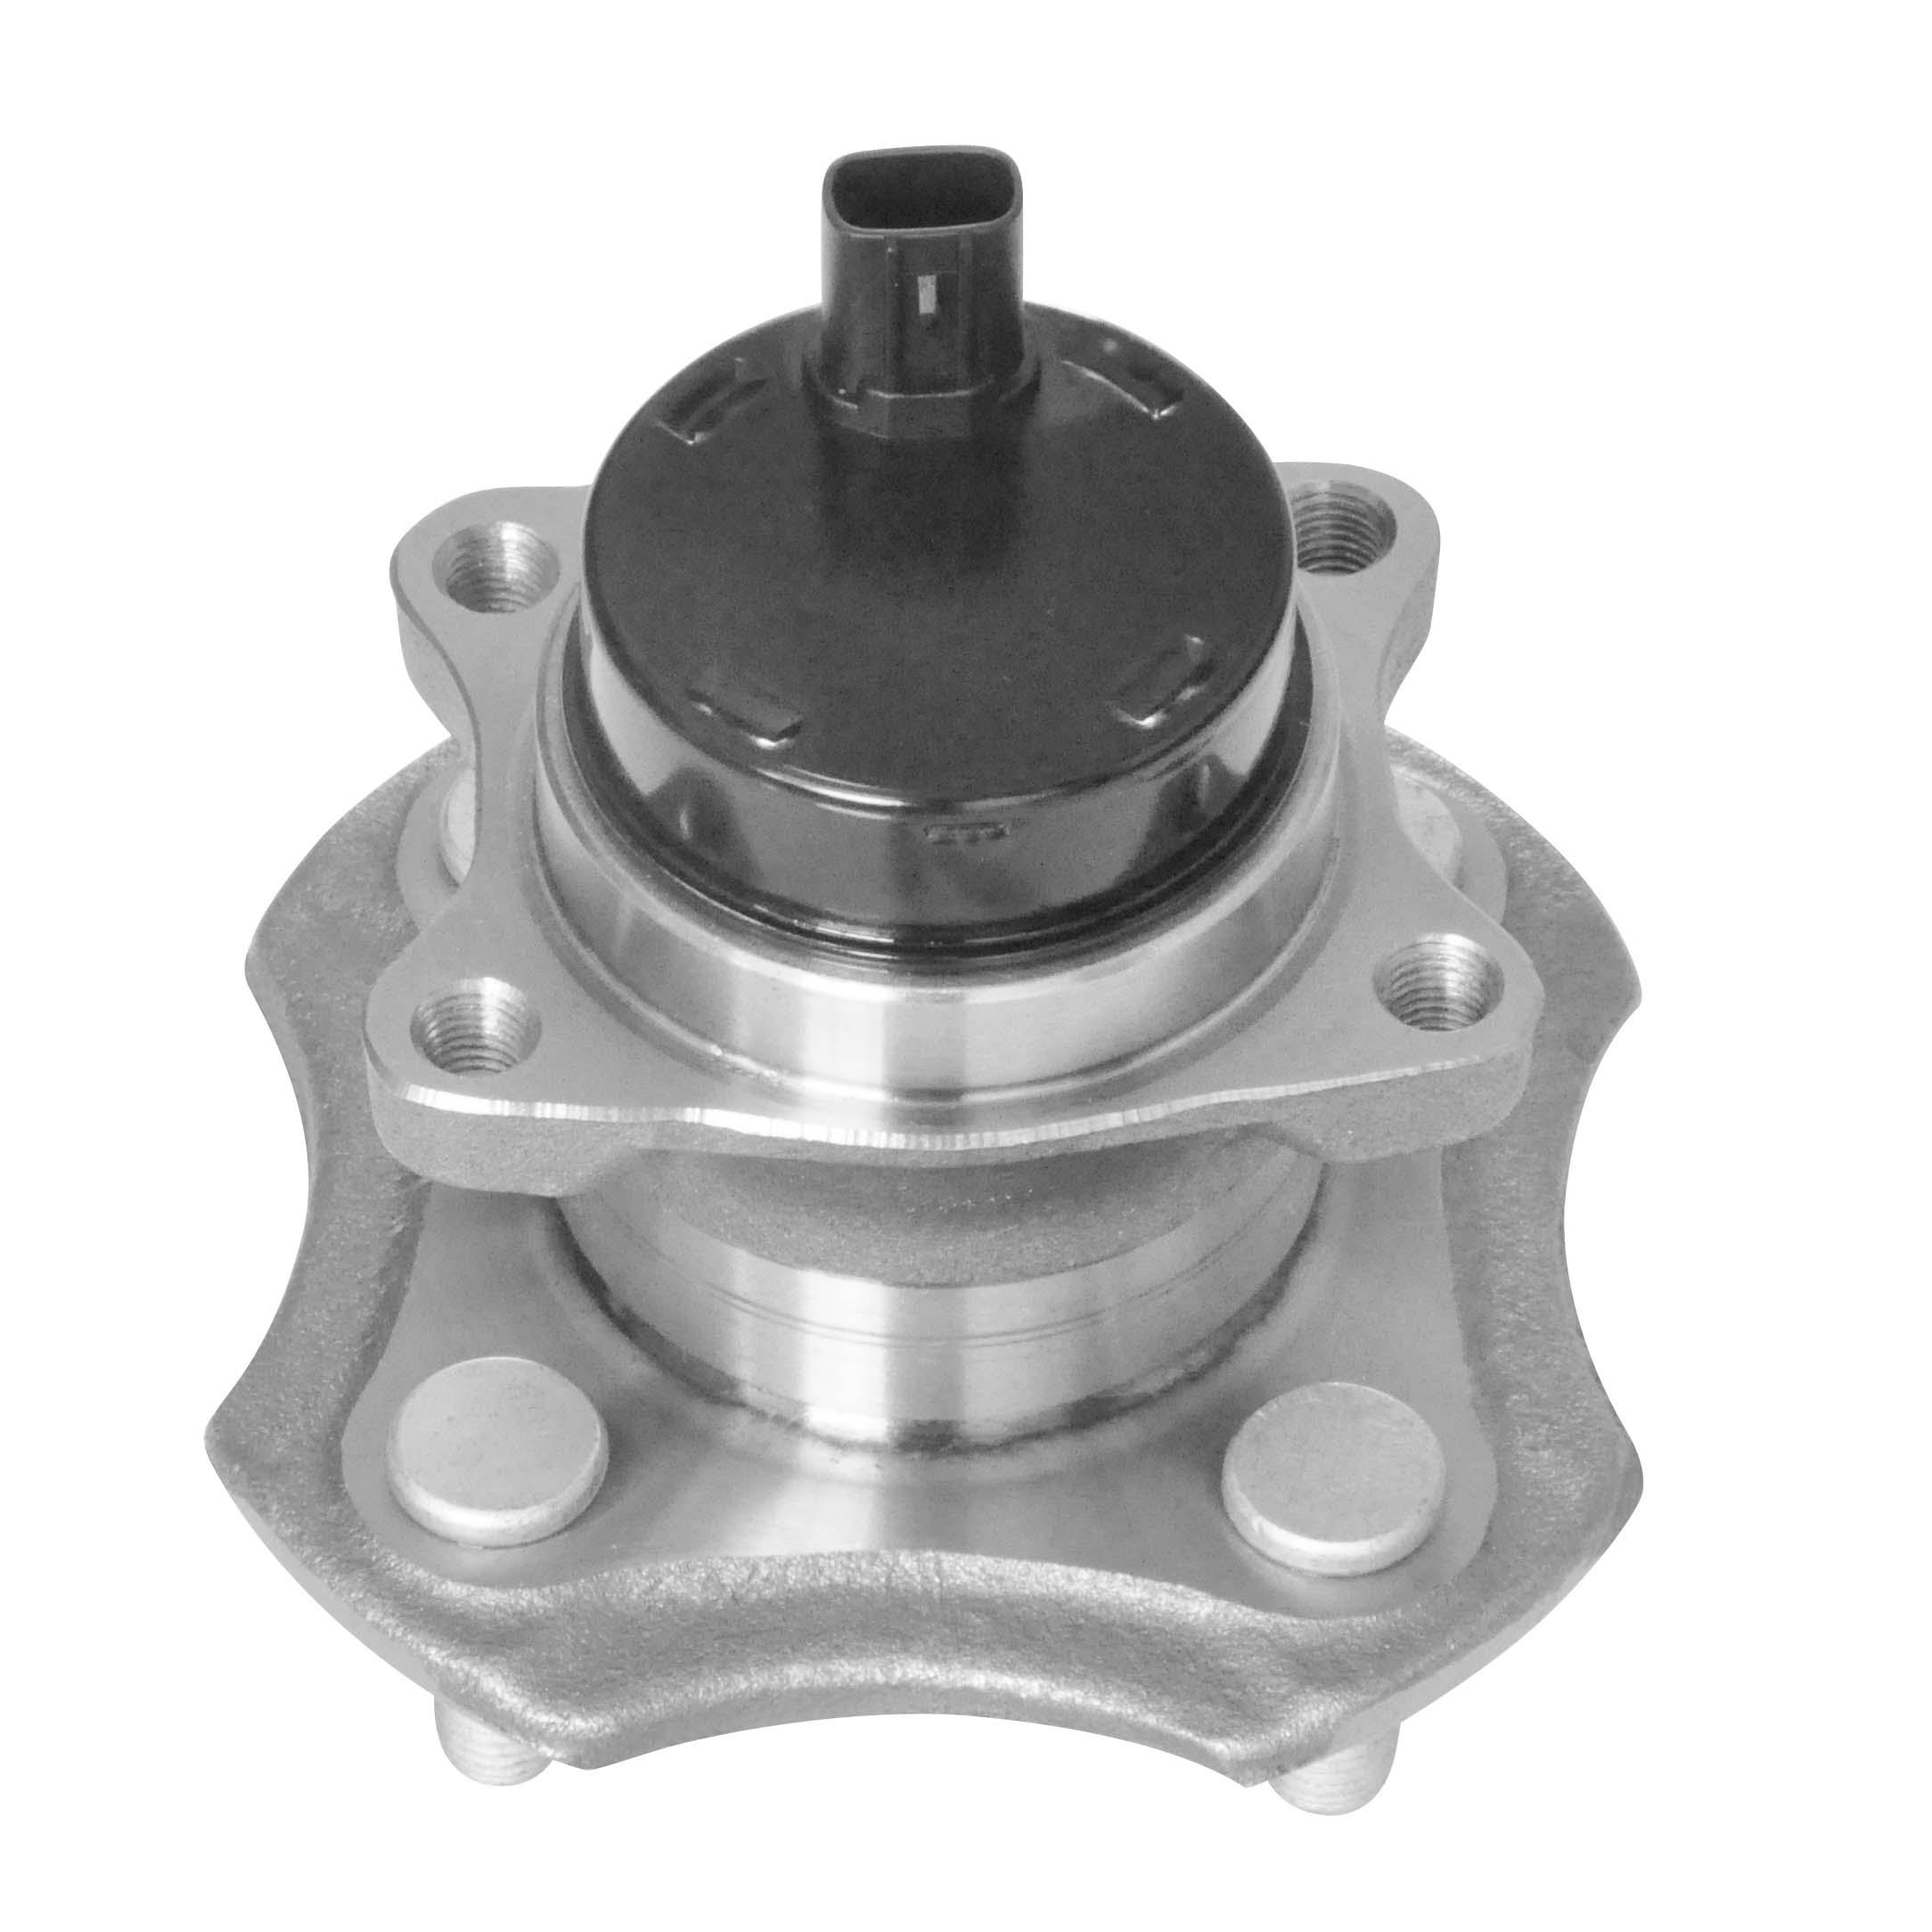 Rear Wheel Hub /& Bearing Assembly Pair Set for 00-06 Scion Toyota xA xB Echo